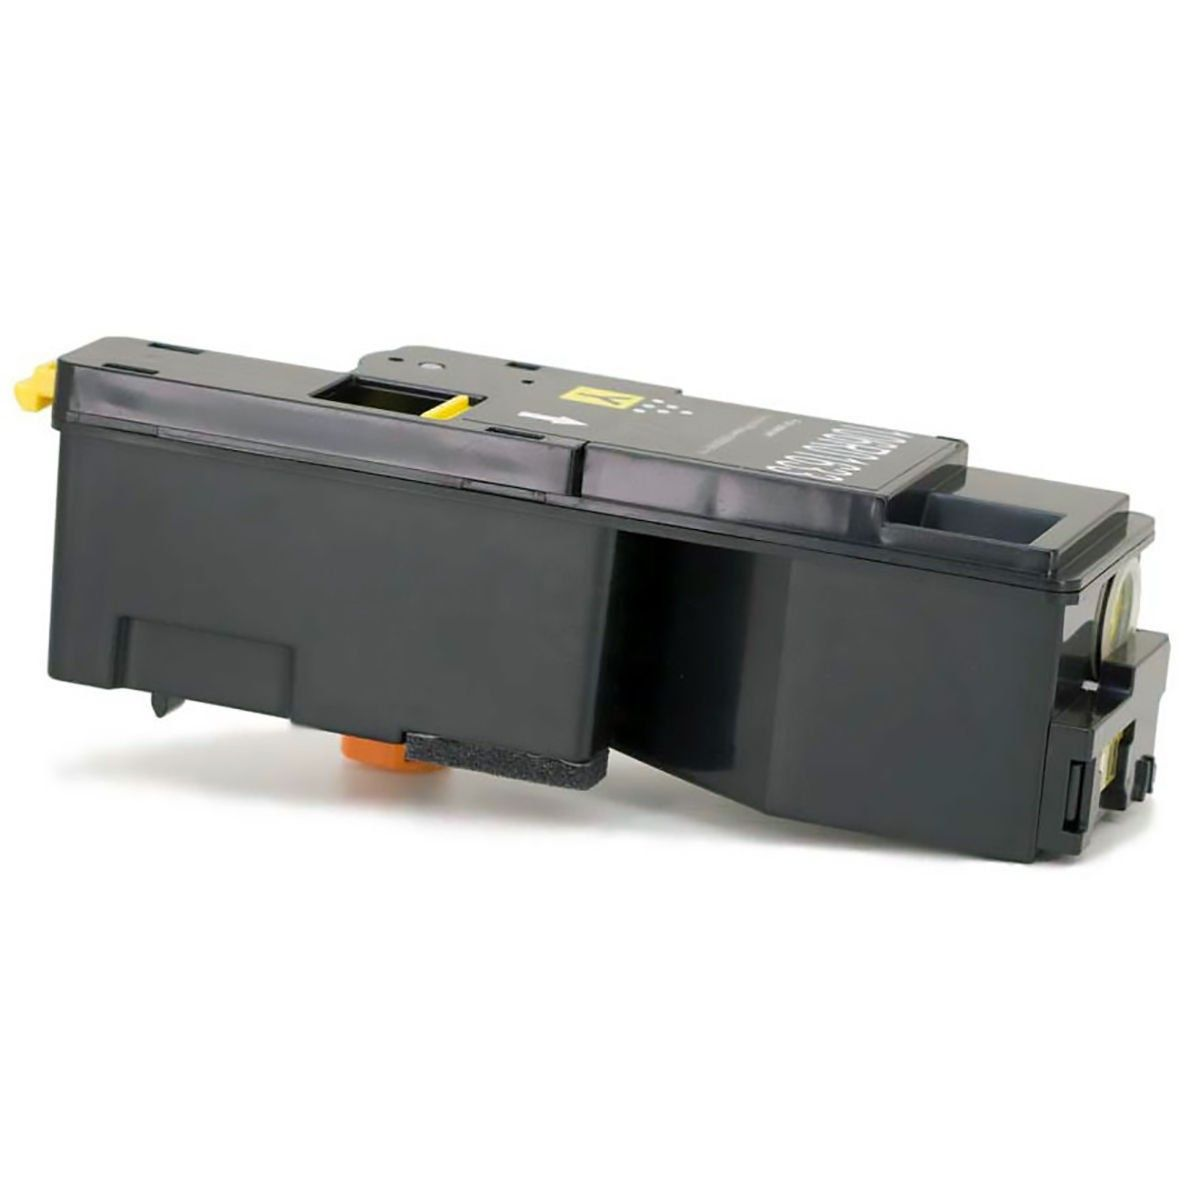 Compatível: Toner 106R01633 para impressora Xerox Phaser 6000 6010 WorkCentre 6015 6015b 6015ni / Amarelo / 1.000